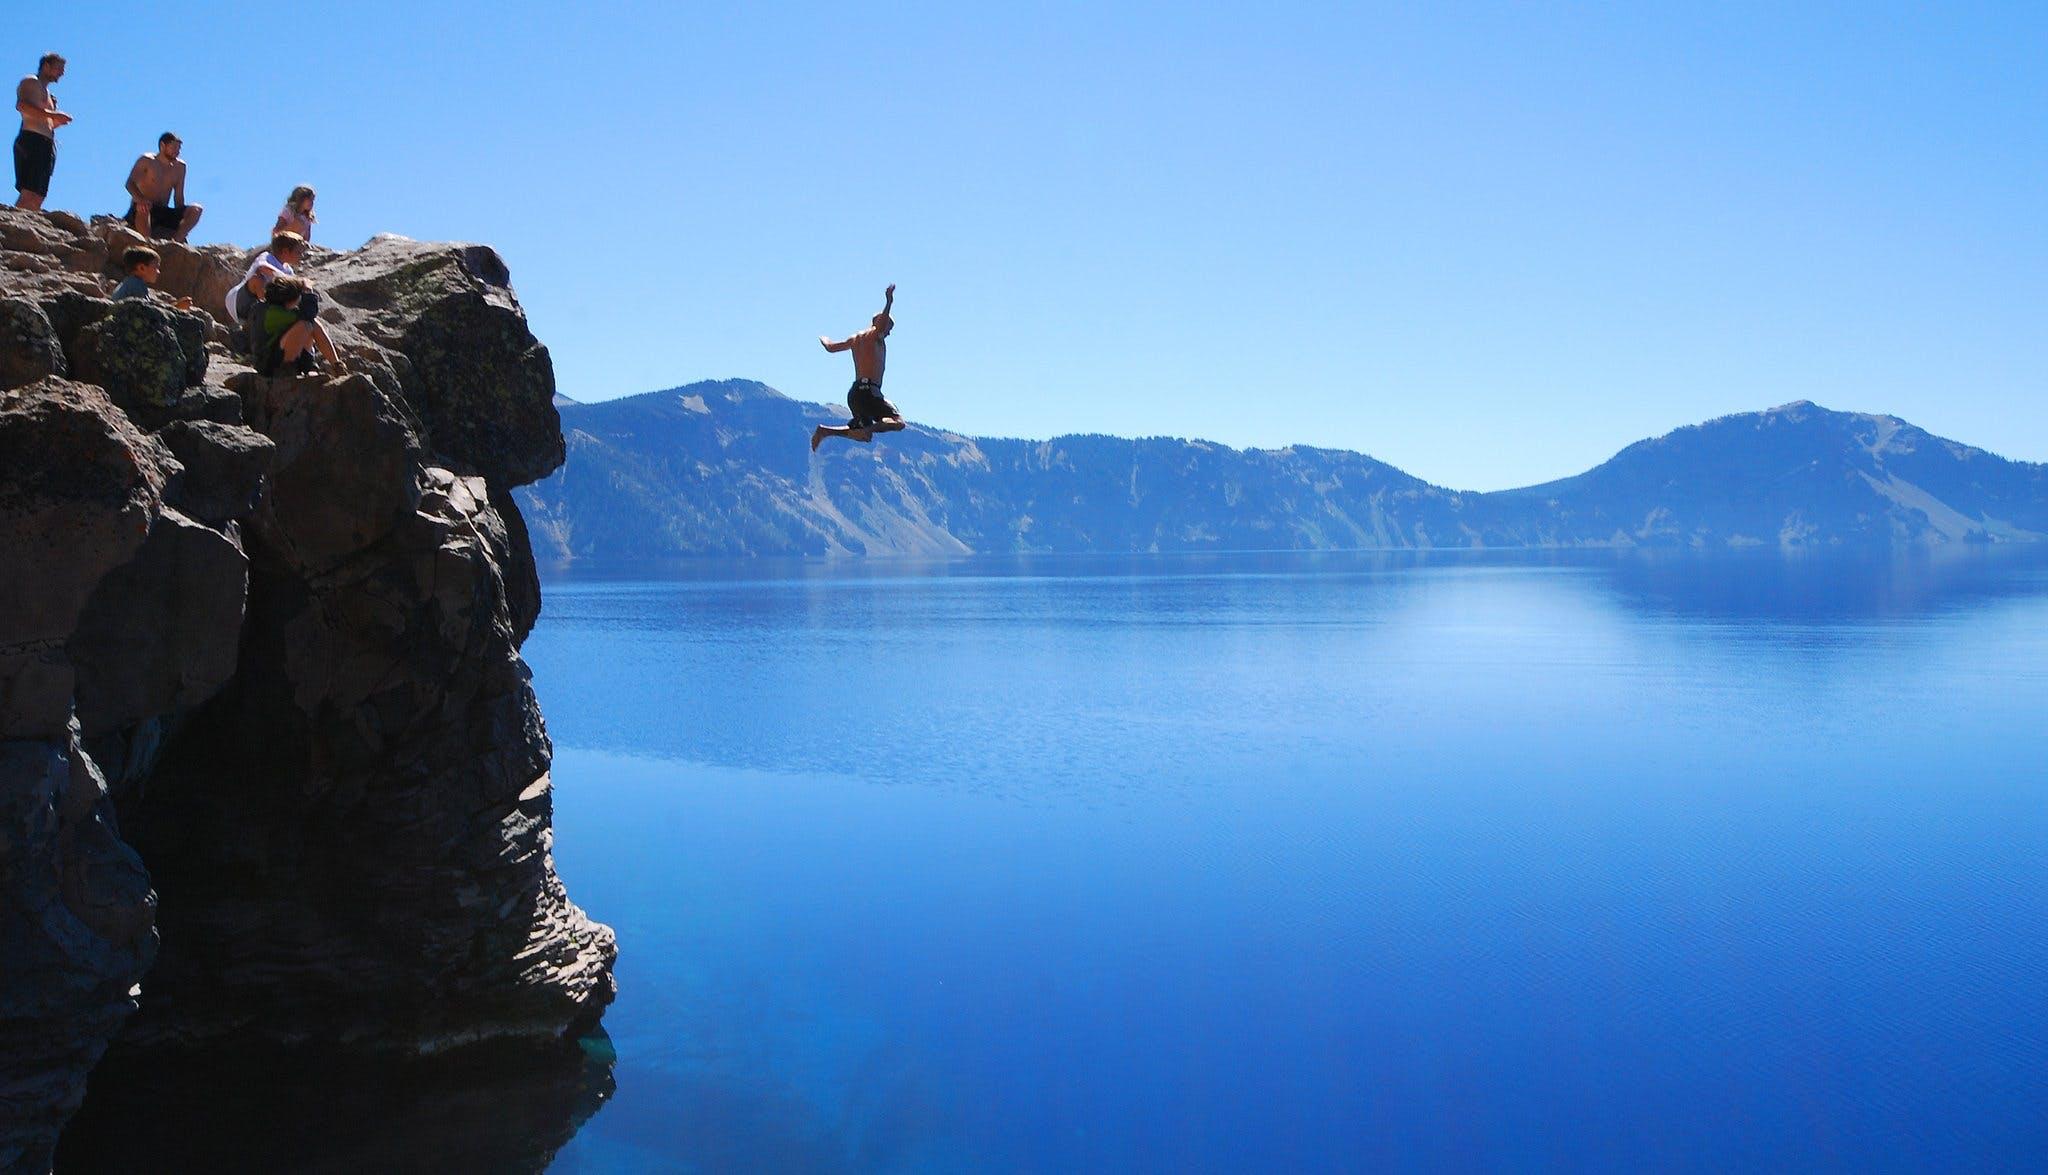 Prøv cliff diving fra høje klipper